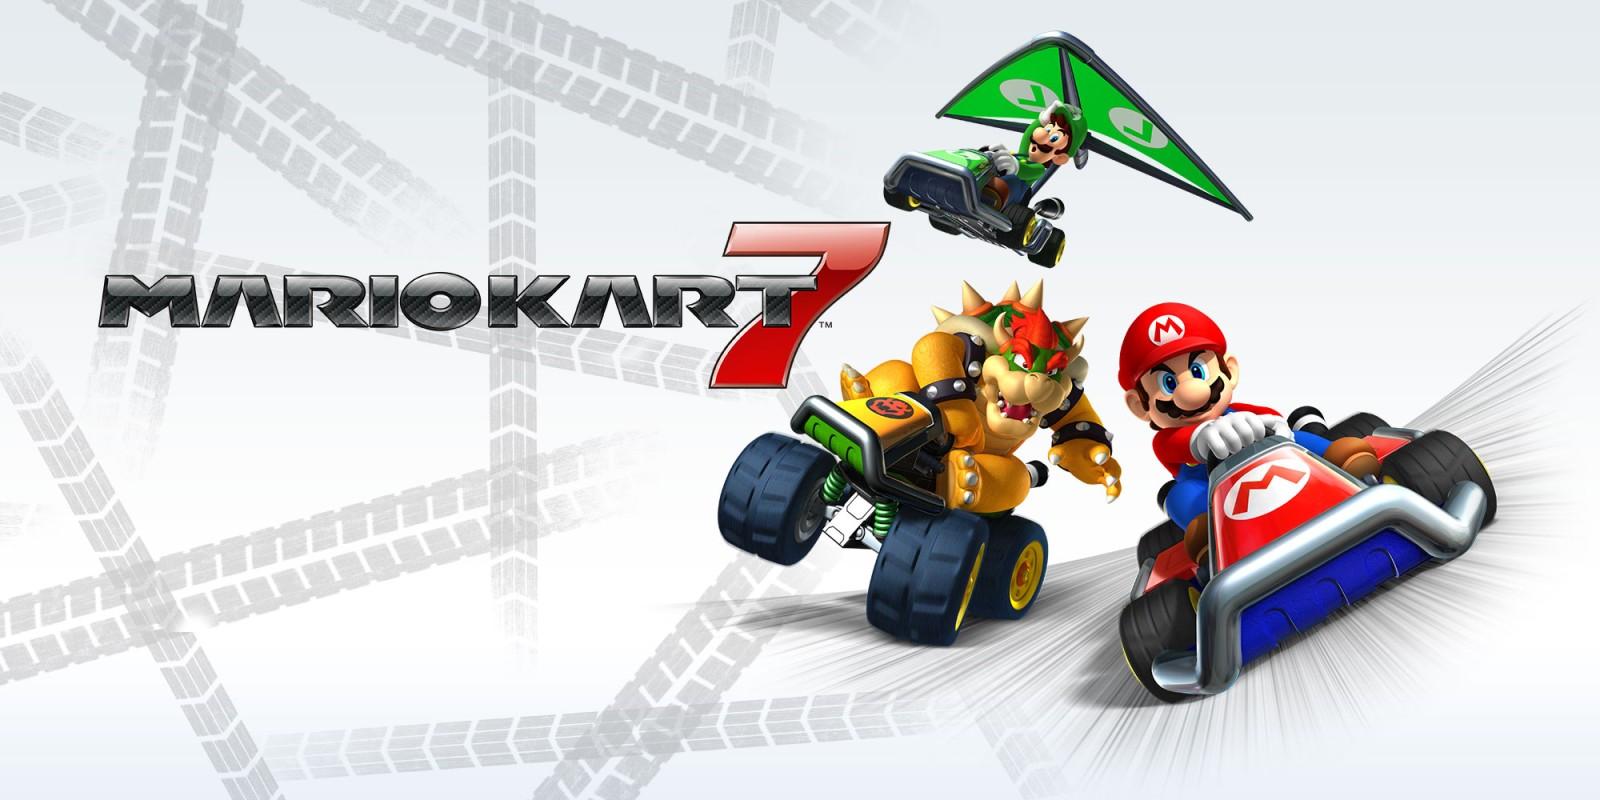 SI_3DS_MarioKart7_image1600w.jpg